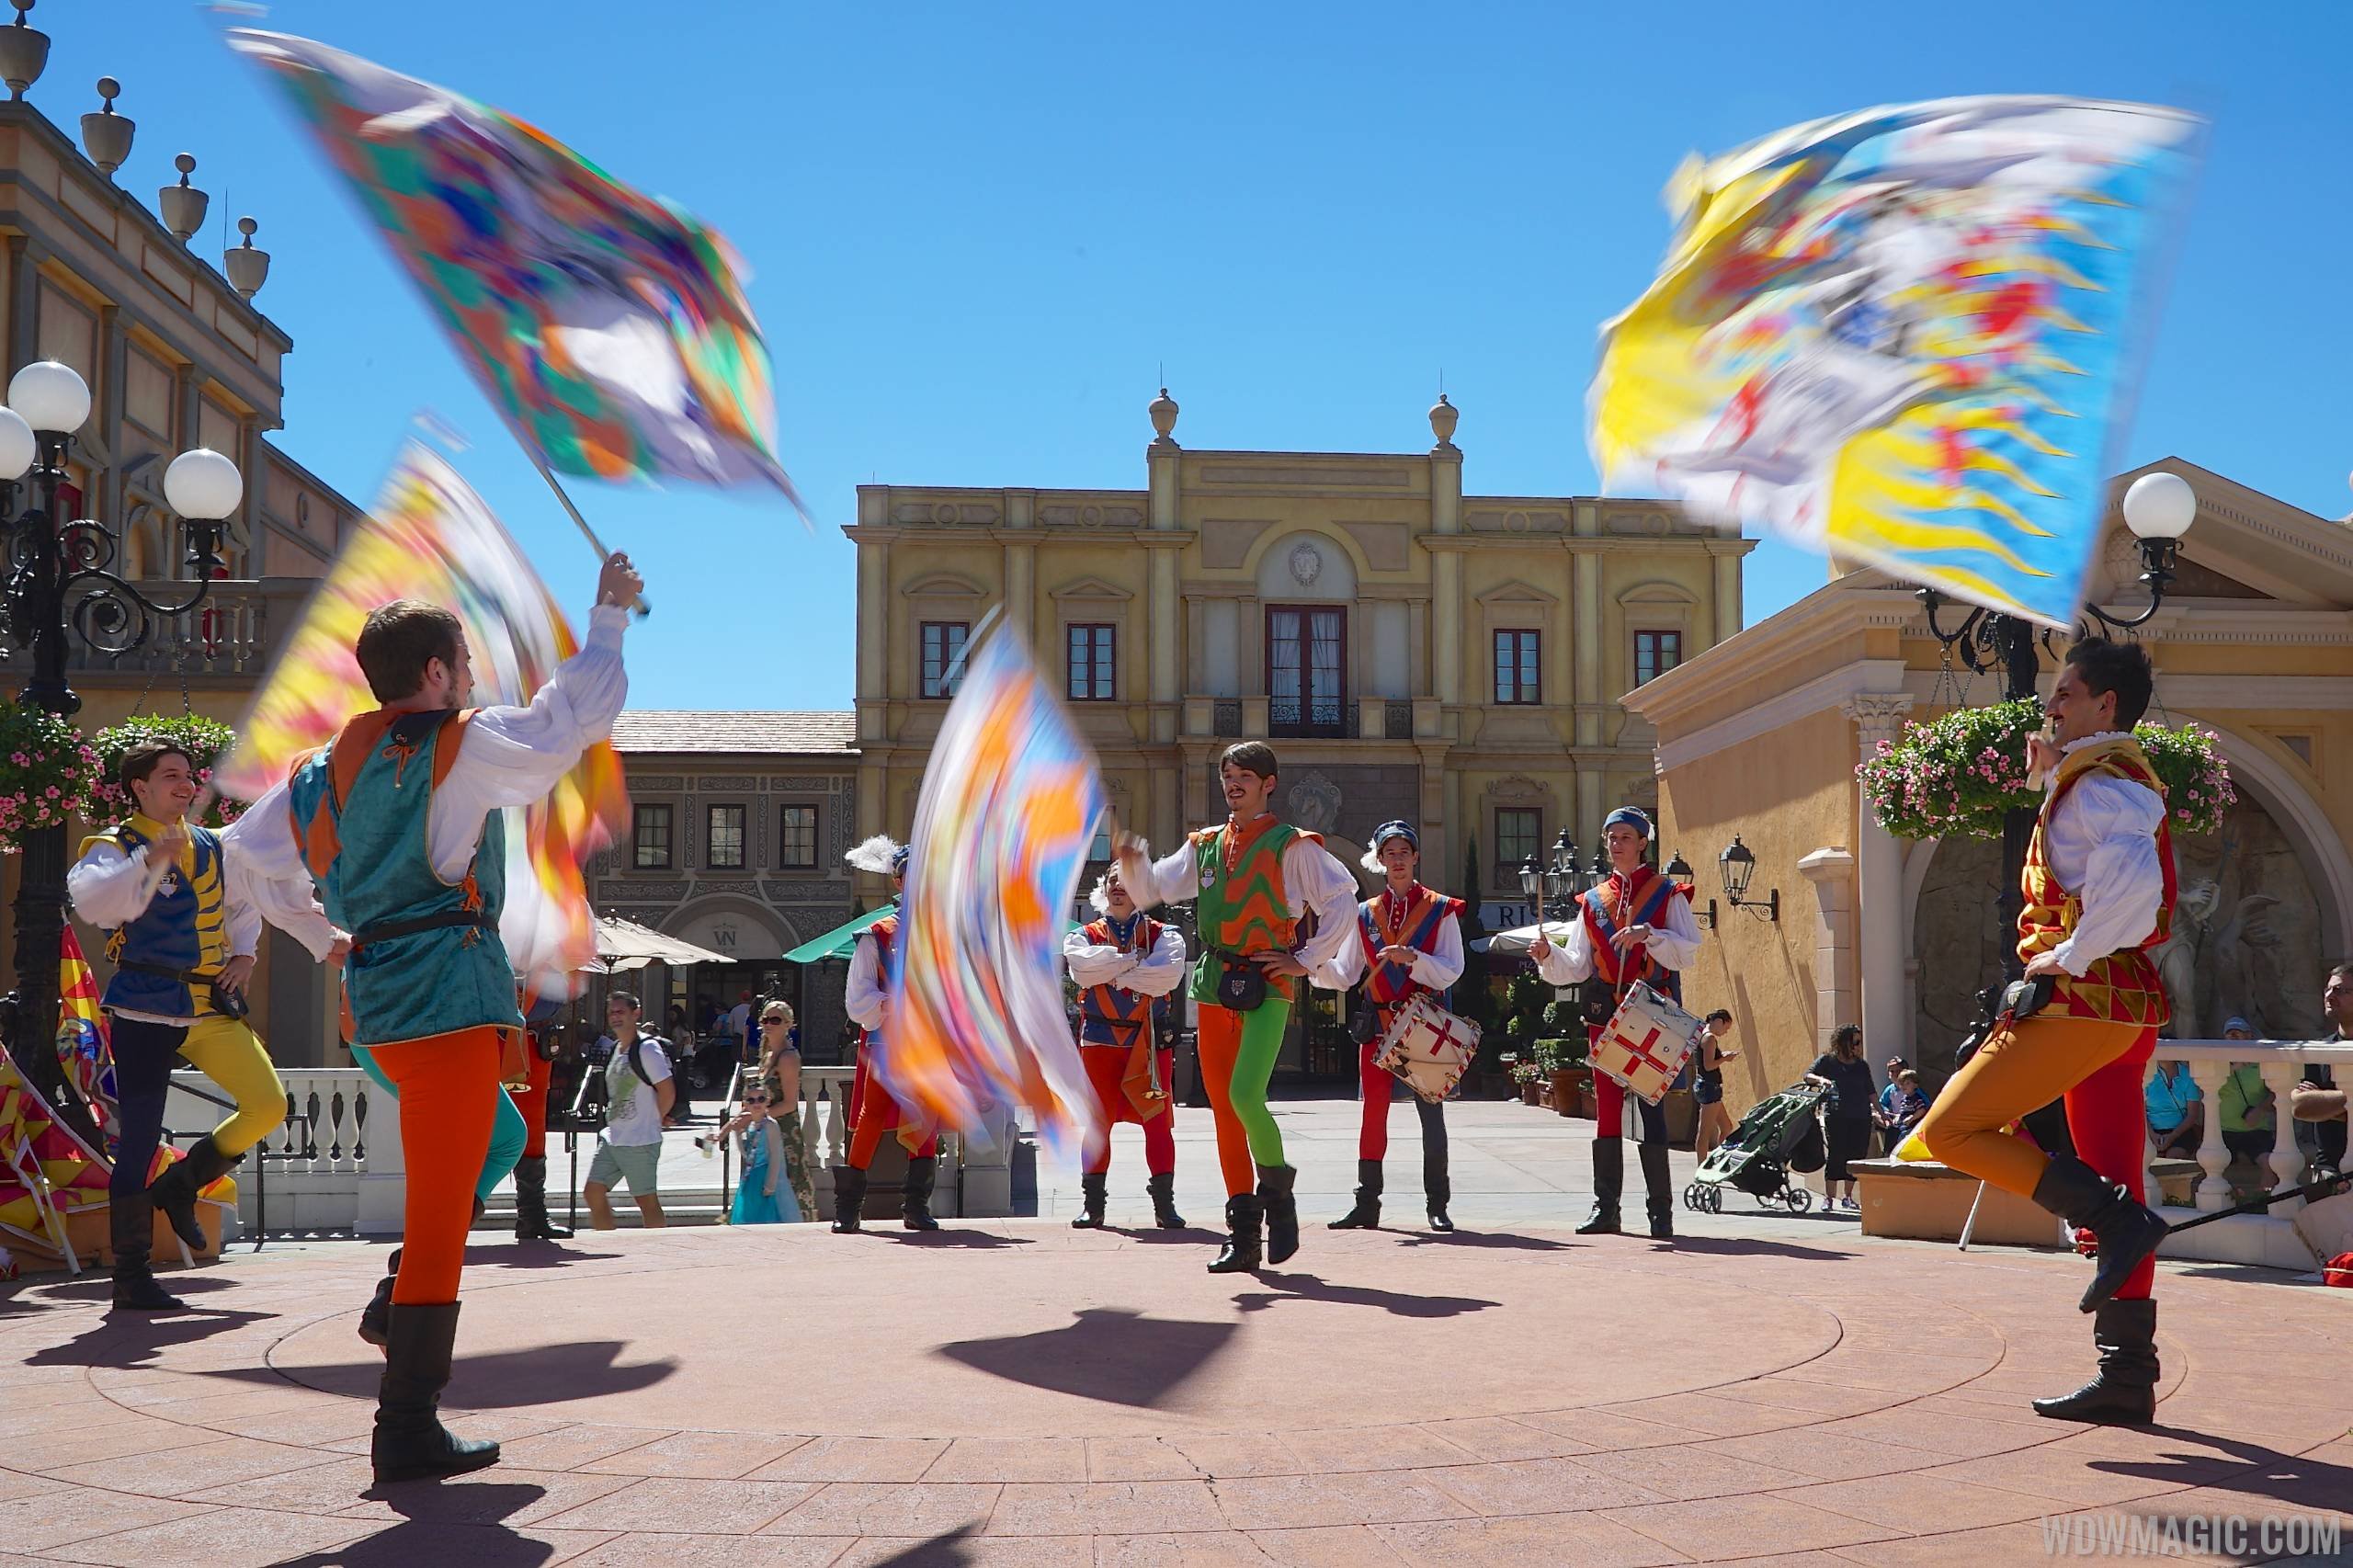 Sbandieratori Di Sansepolcro - Italy Flag Waving performance